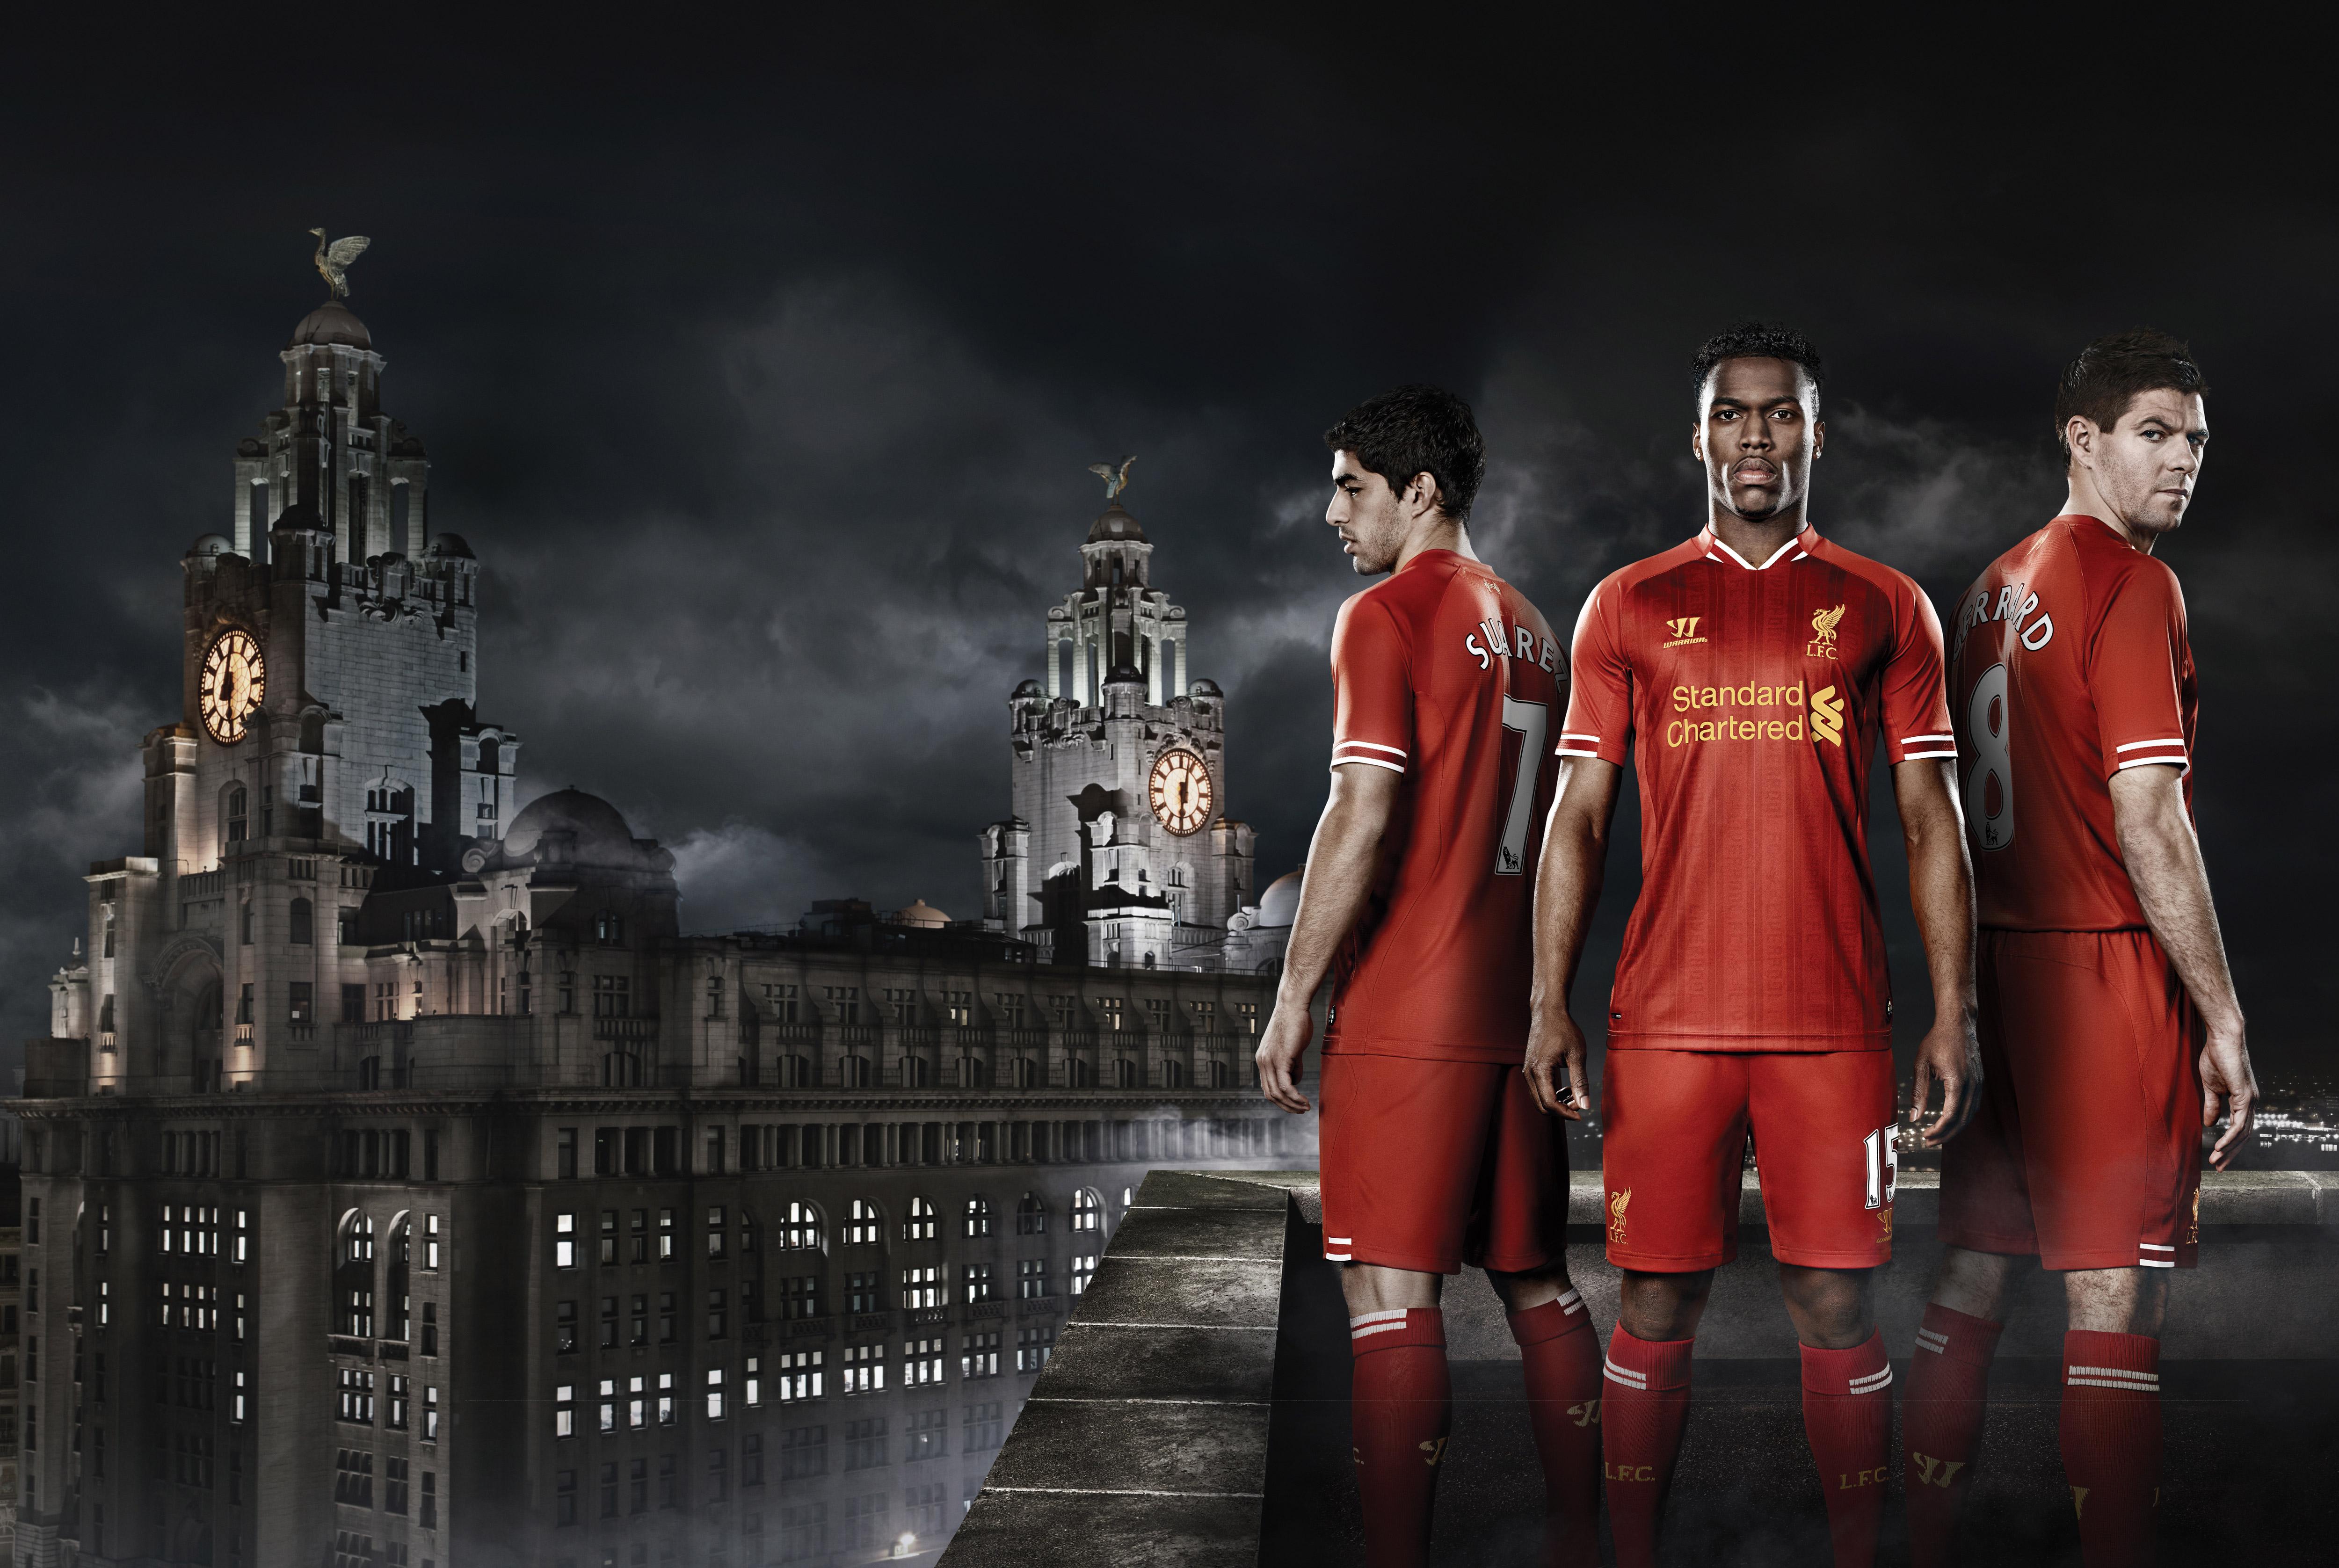 Liverpool FC Daniel Sturridge Luis Suarez Steven Gerrard (1366x768 Resolution)